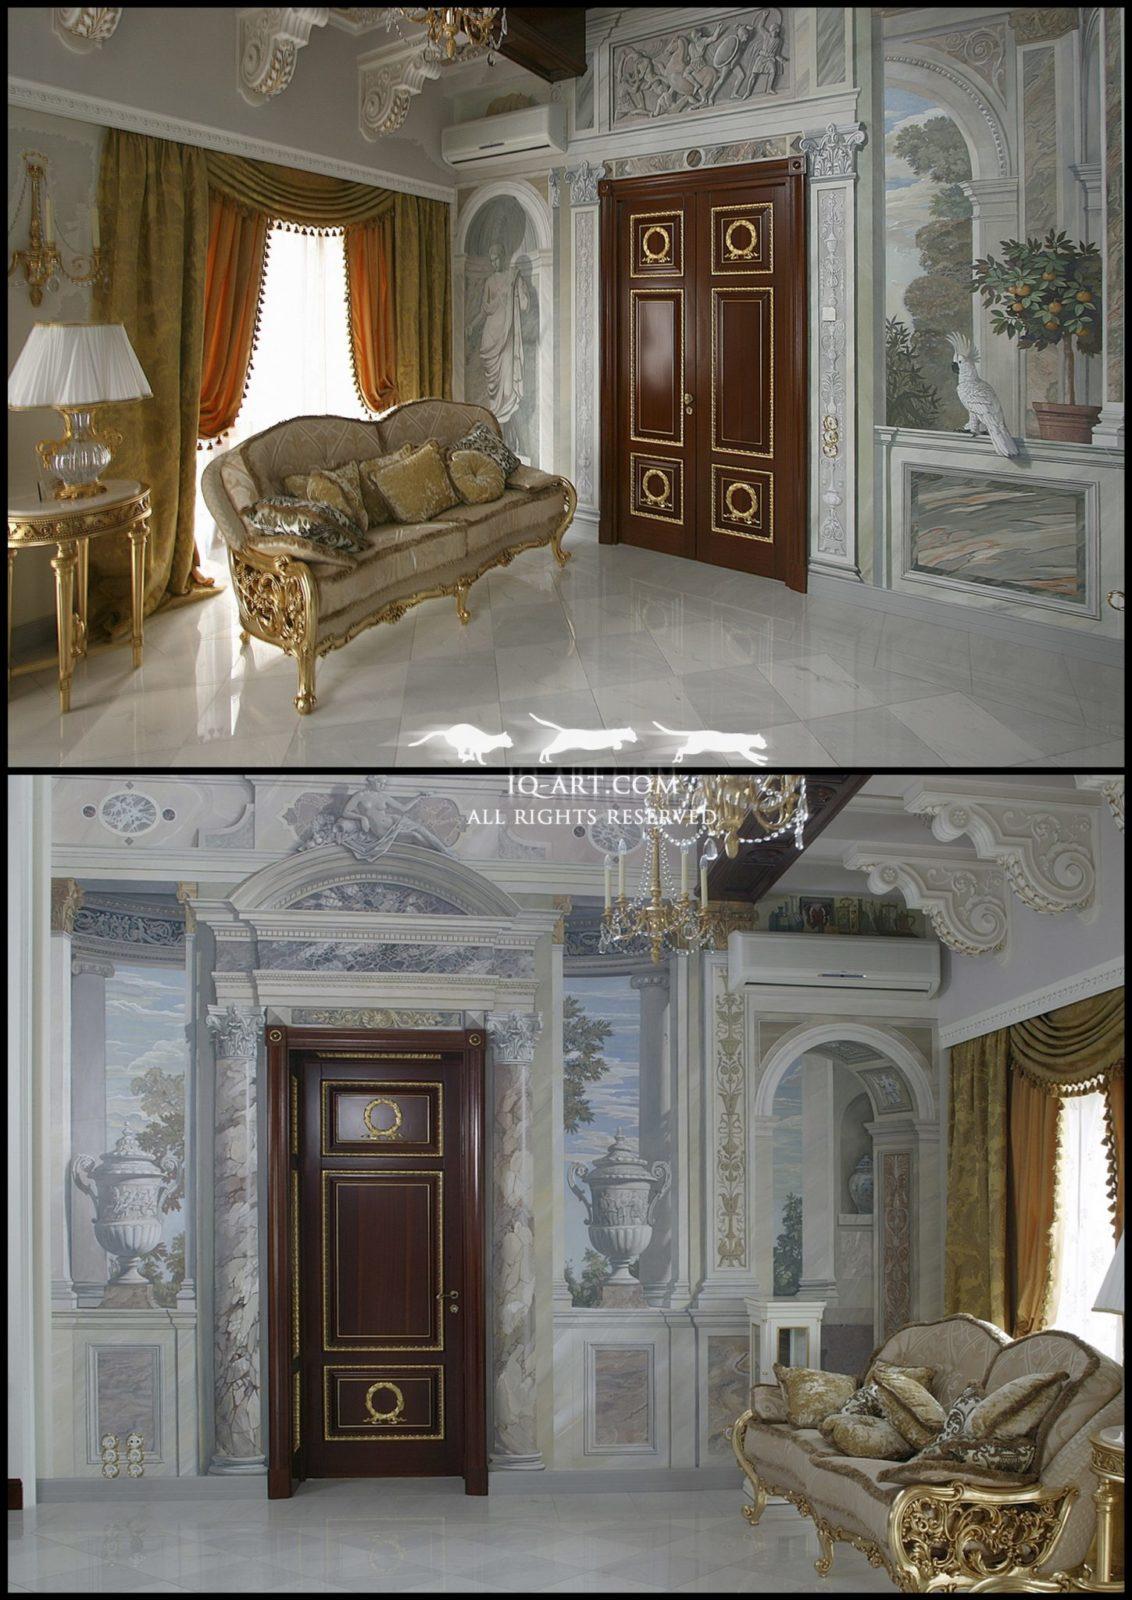 30 art interiors